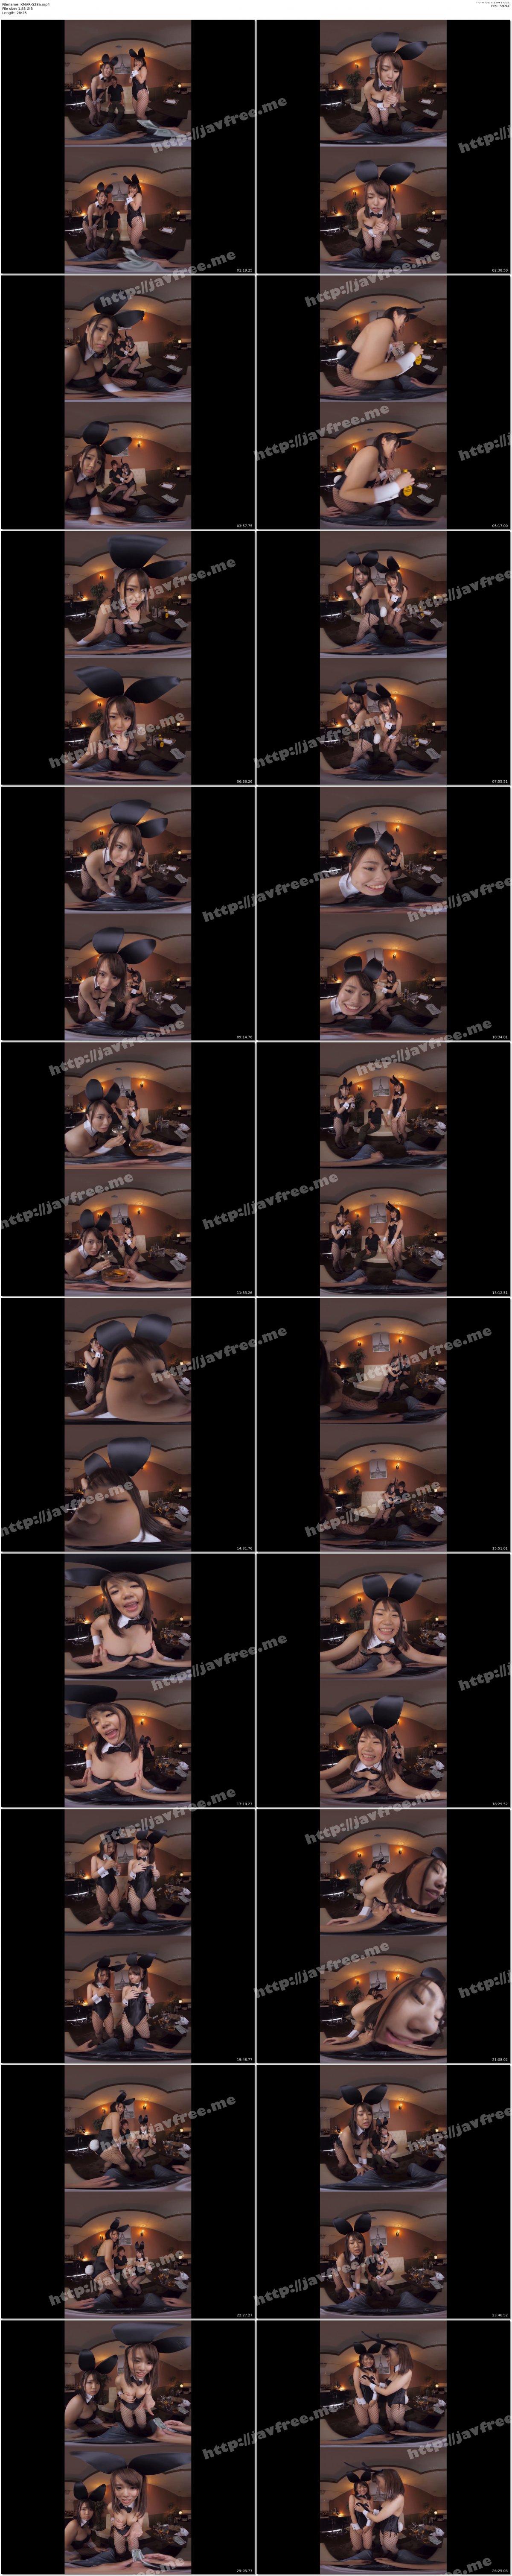 [HD][PTS-437] 素人妻と童貞くんの筆下しドキュメント 35歳以上の奥さま限定! 混浴でディープキス指南してたら興奮しちゃって初対面なのに止まらない中出し9射精50イキ! - image KMVR-528a on https://javfree.me